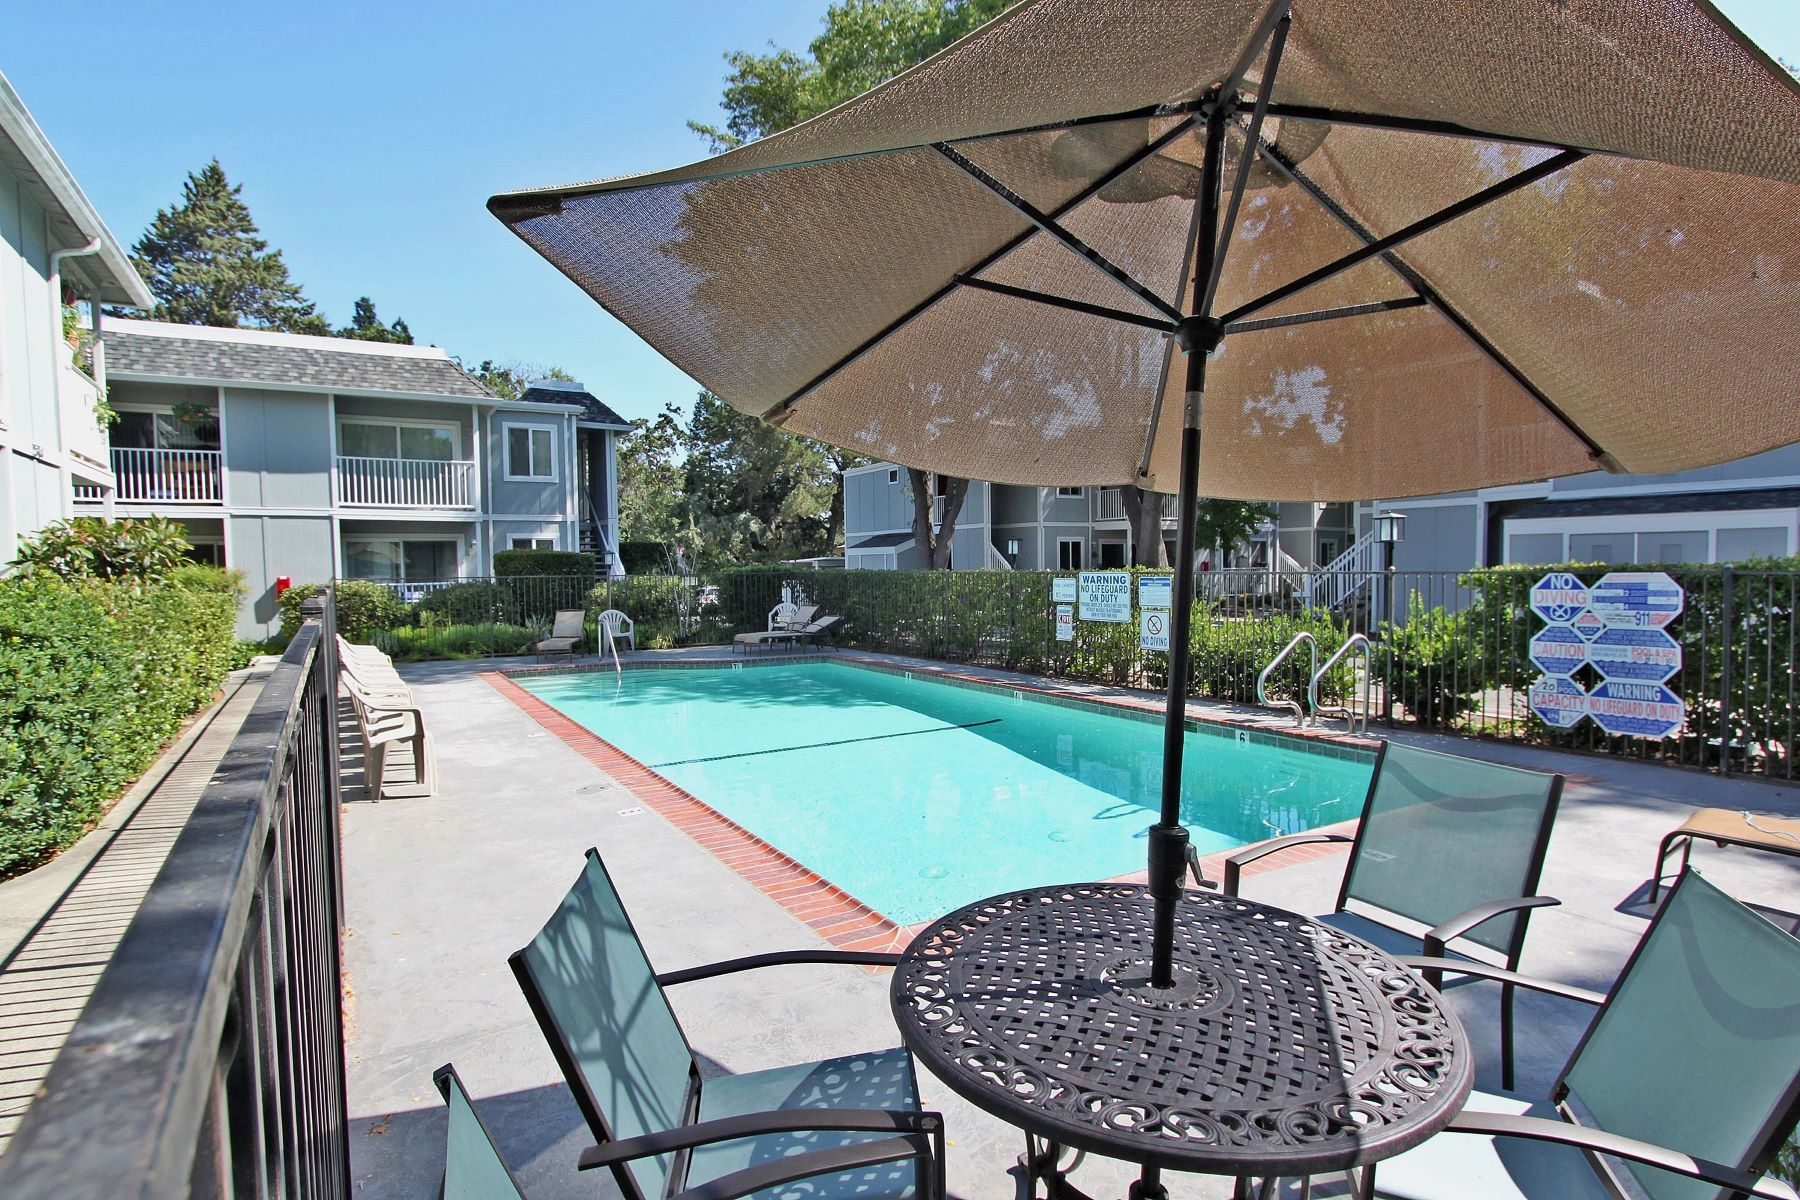 Additional photo for property listing at Private Ground Floor Location 1564 Sunnyvale Avenue #5 Walnut Creek, California 94597 Estados Unidos